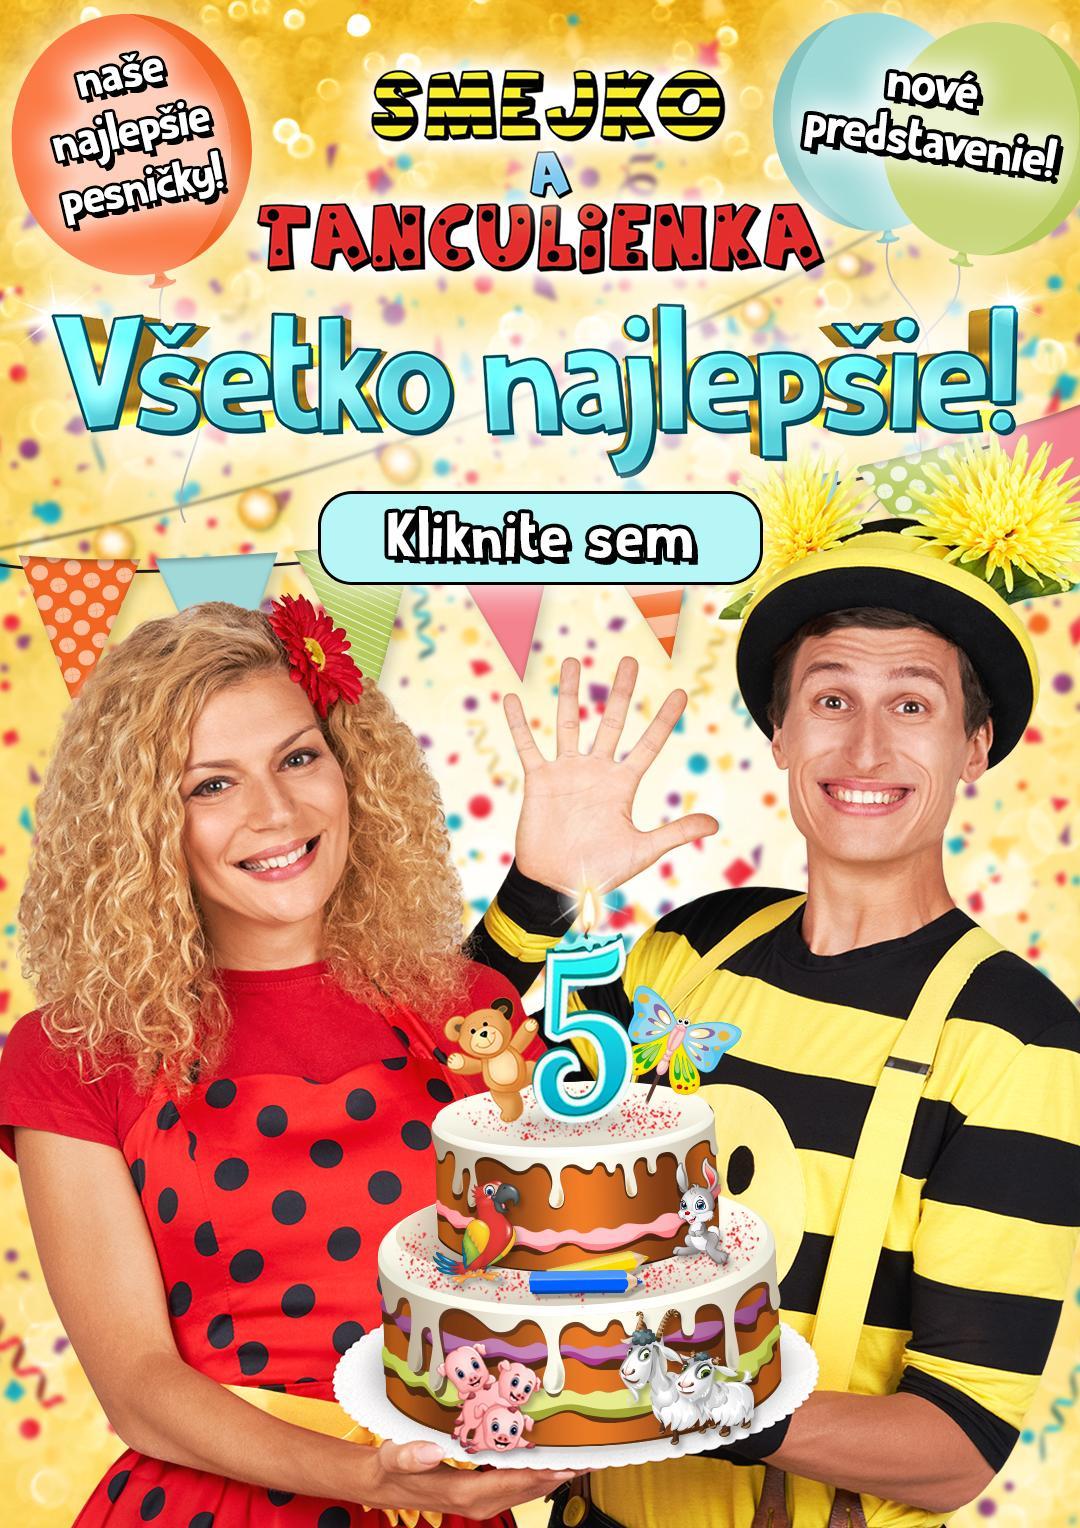 Smejko a Tanculienka - 17. 4. 2021 v 17.00